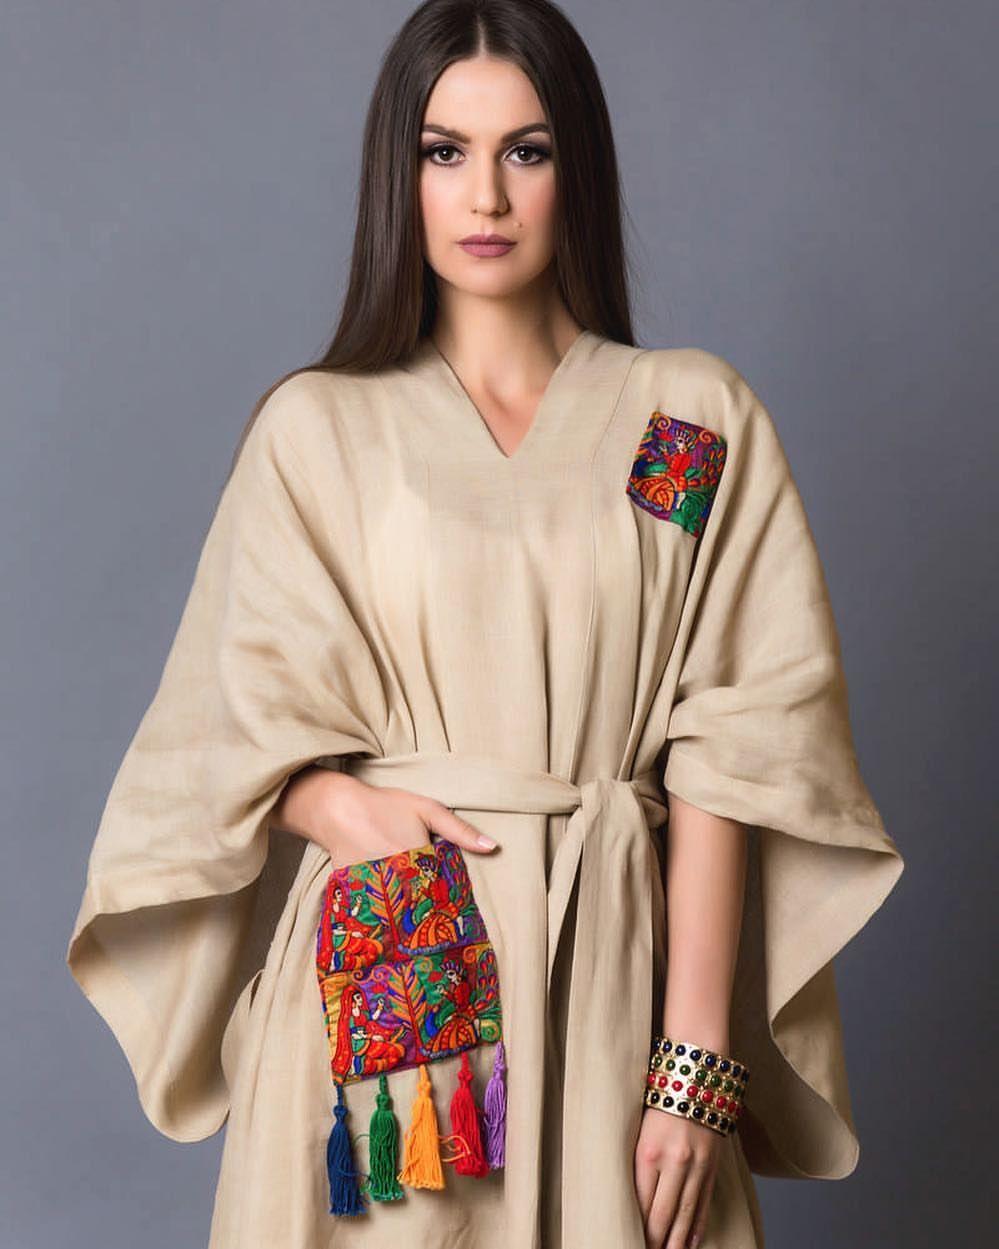 138 Likes 21 Comments Nada Bugshan By Nb On Instagram 2016 Ramadan Collection Model Susamasusam Abayas Fashion Iranian Women Fashion Fashion Dresses